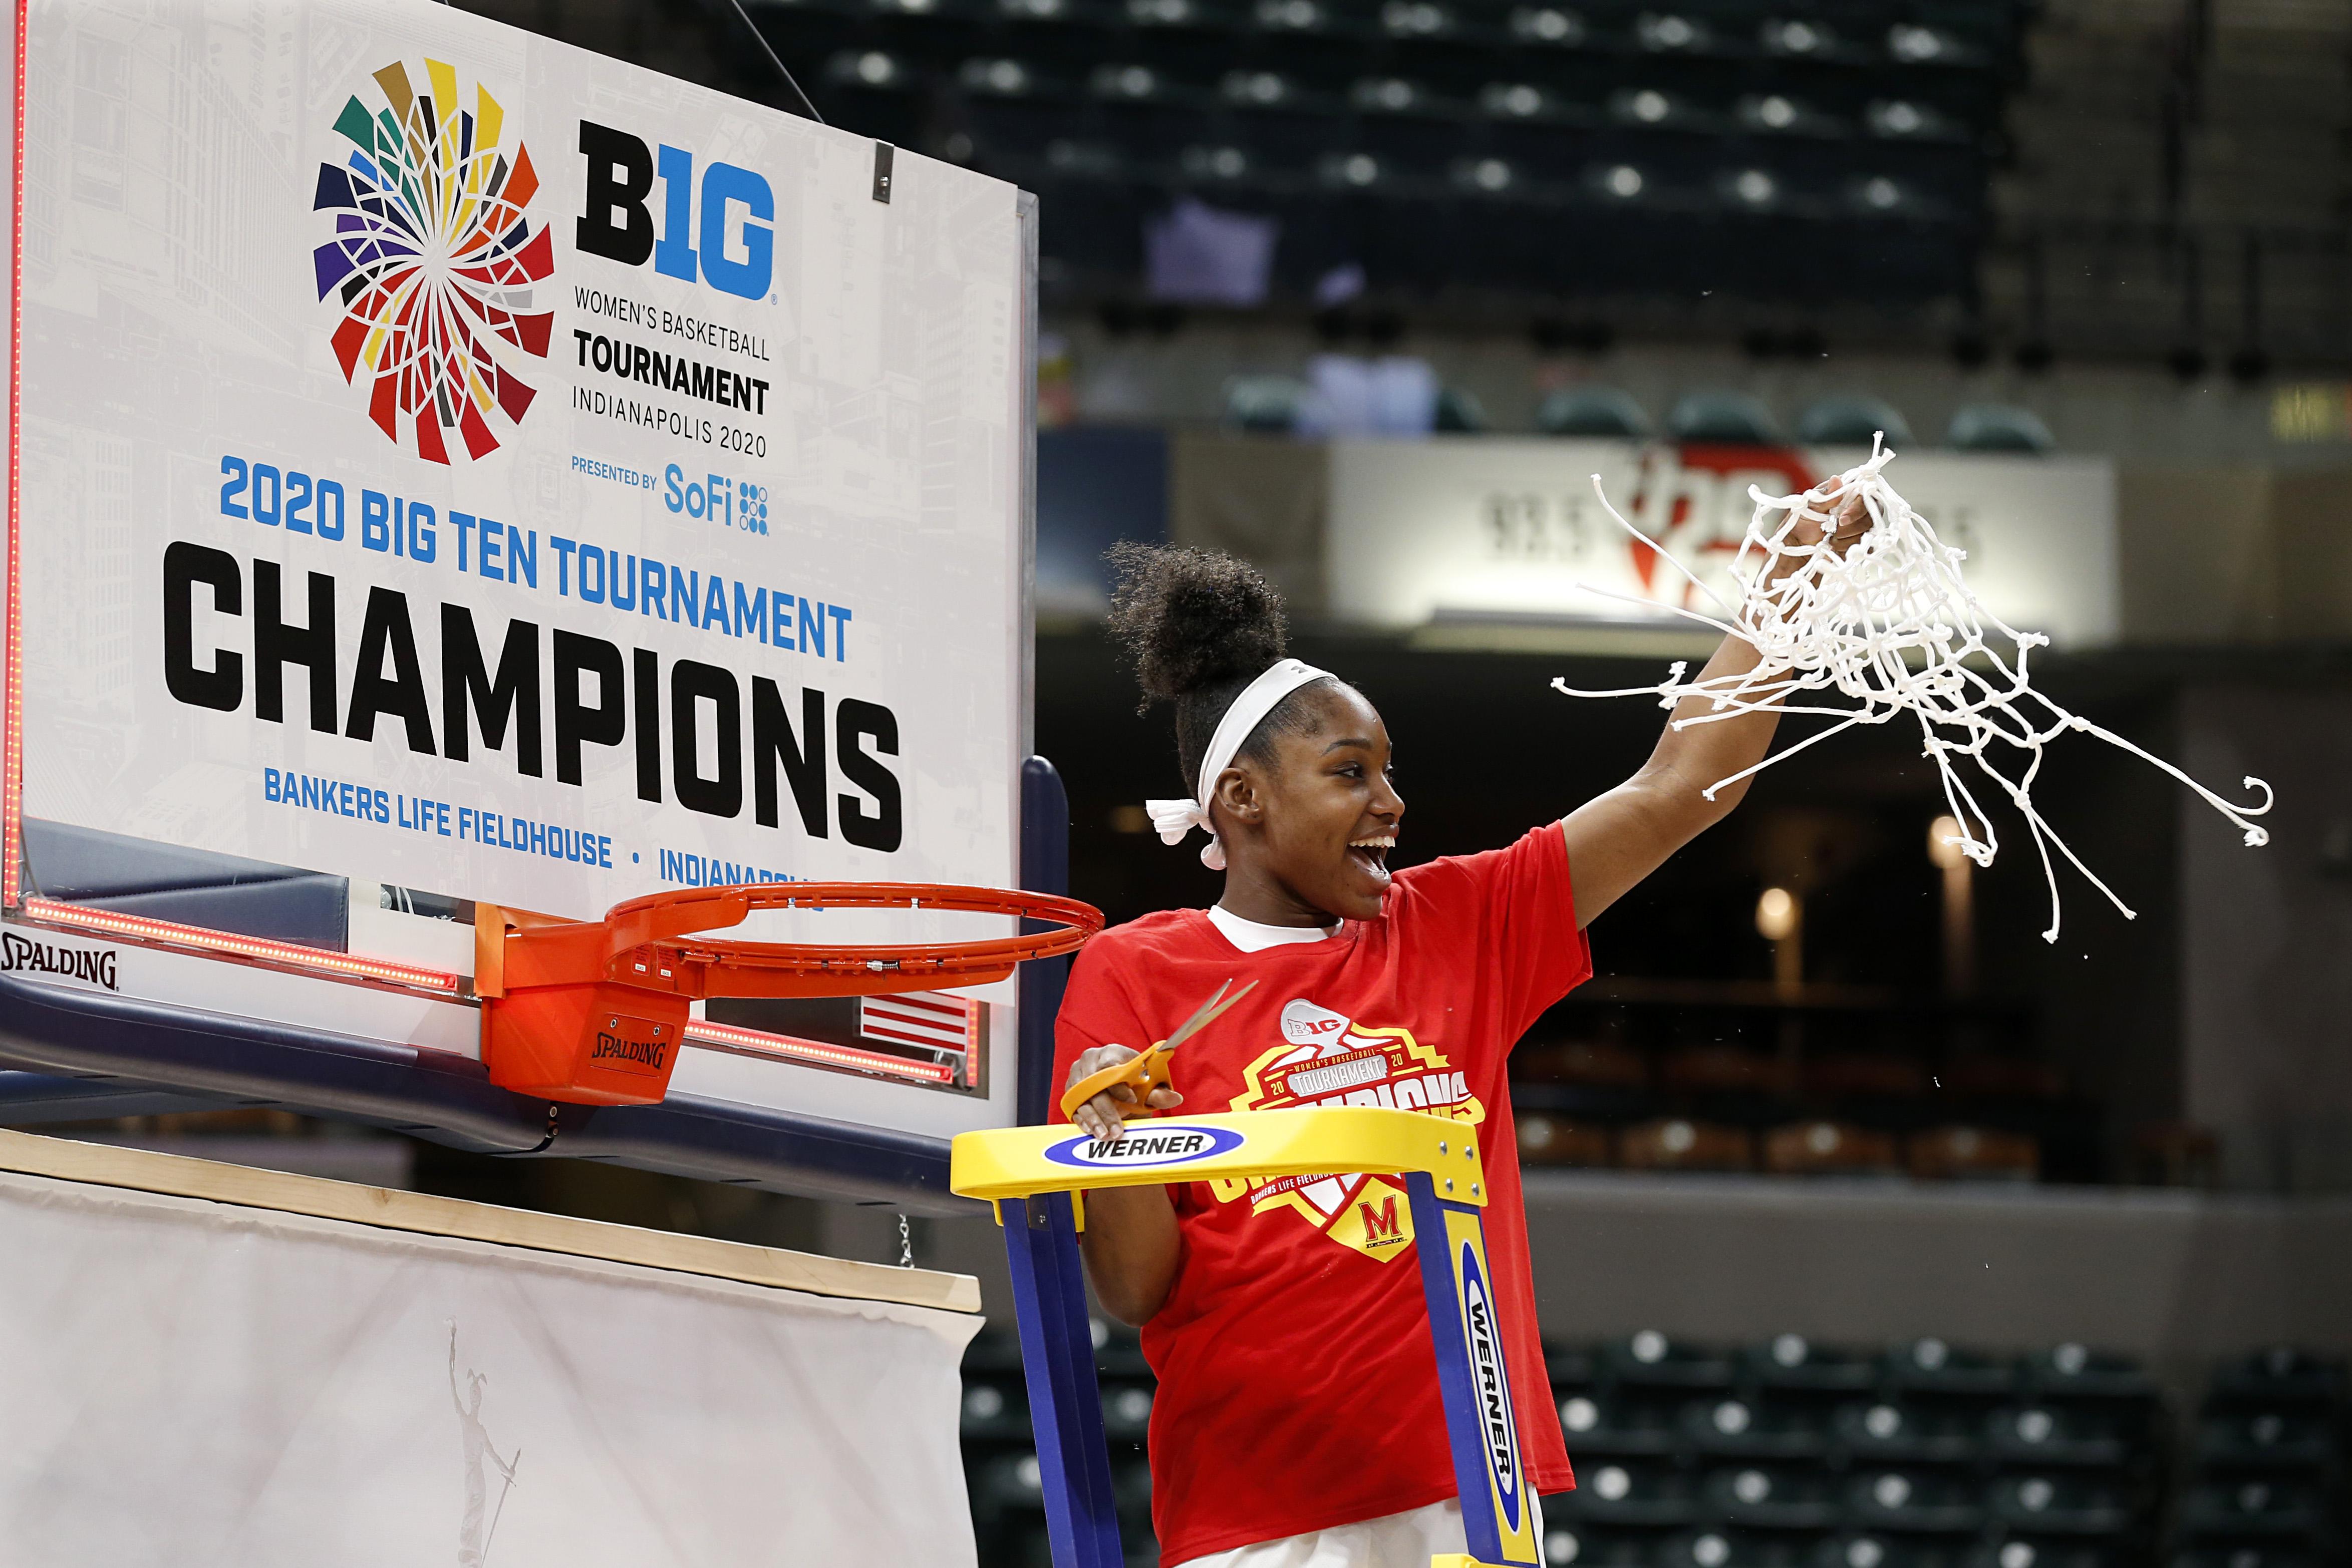 Big Ten Women's Basketball Tournament - Championship